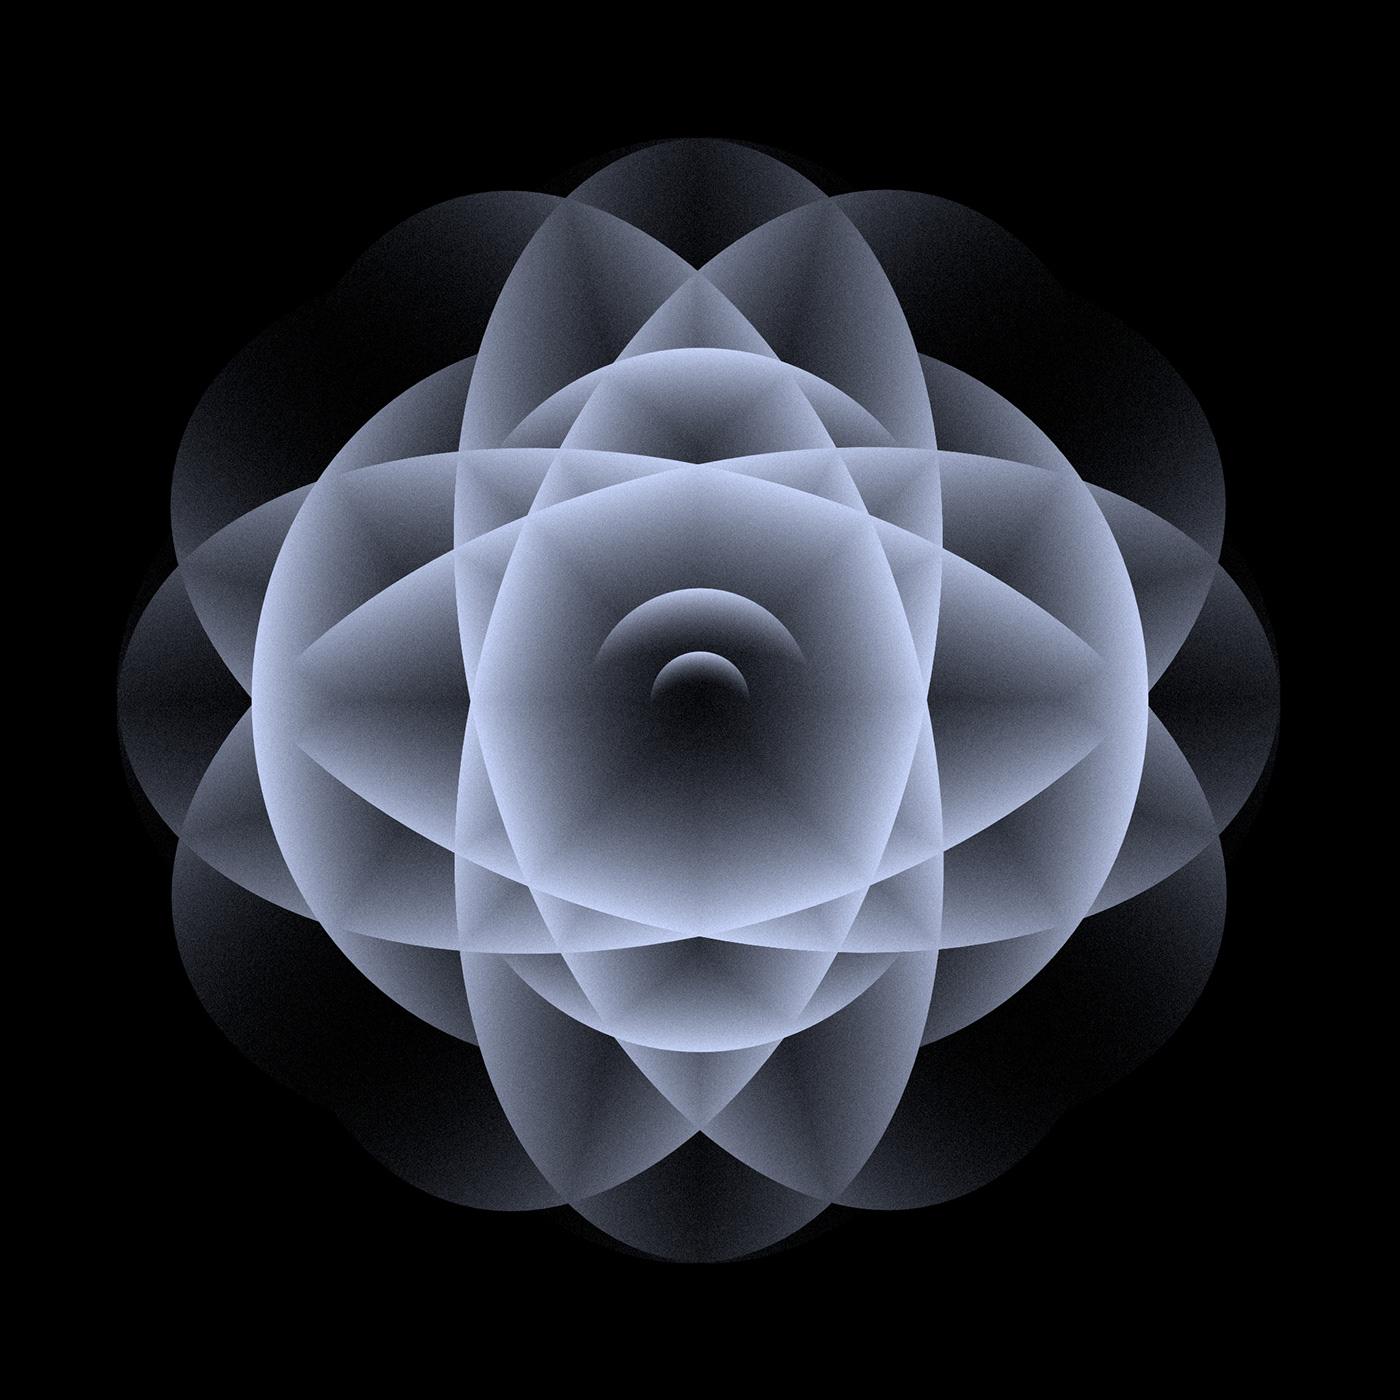 abstract contemporary art Digital Art  geometry gradient ILLUSTRATION  monochrome nft